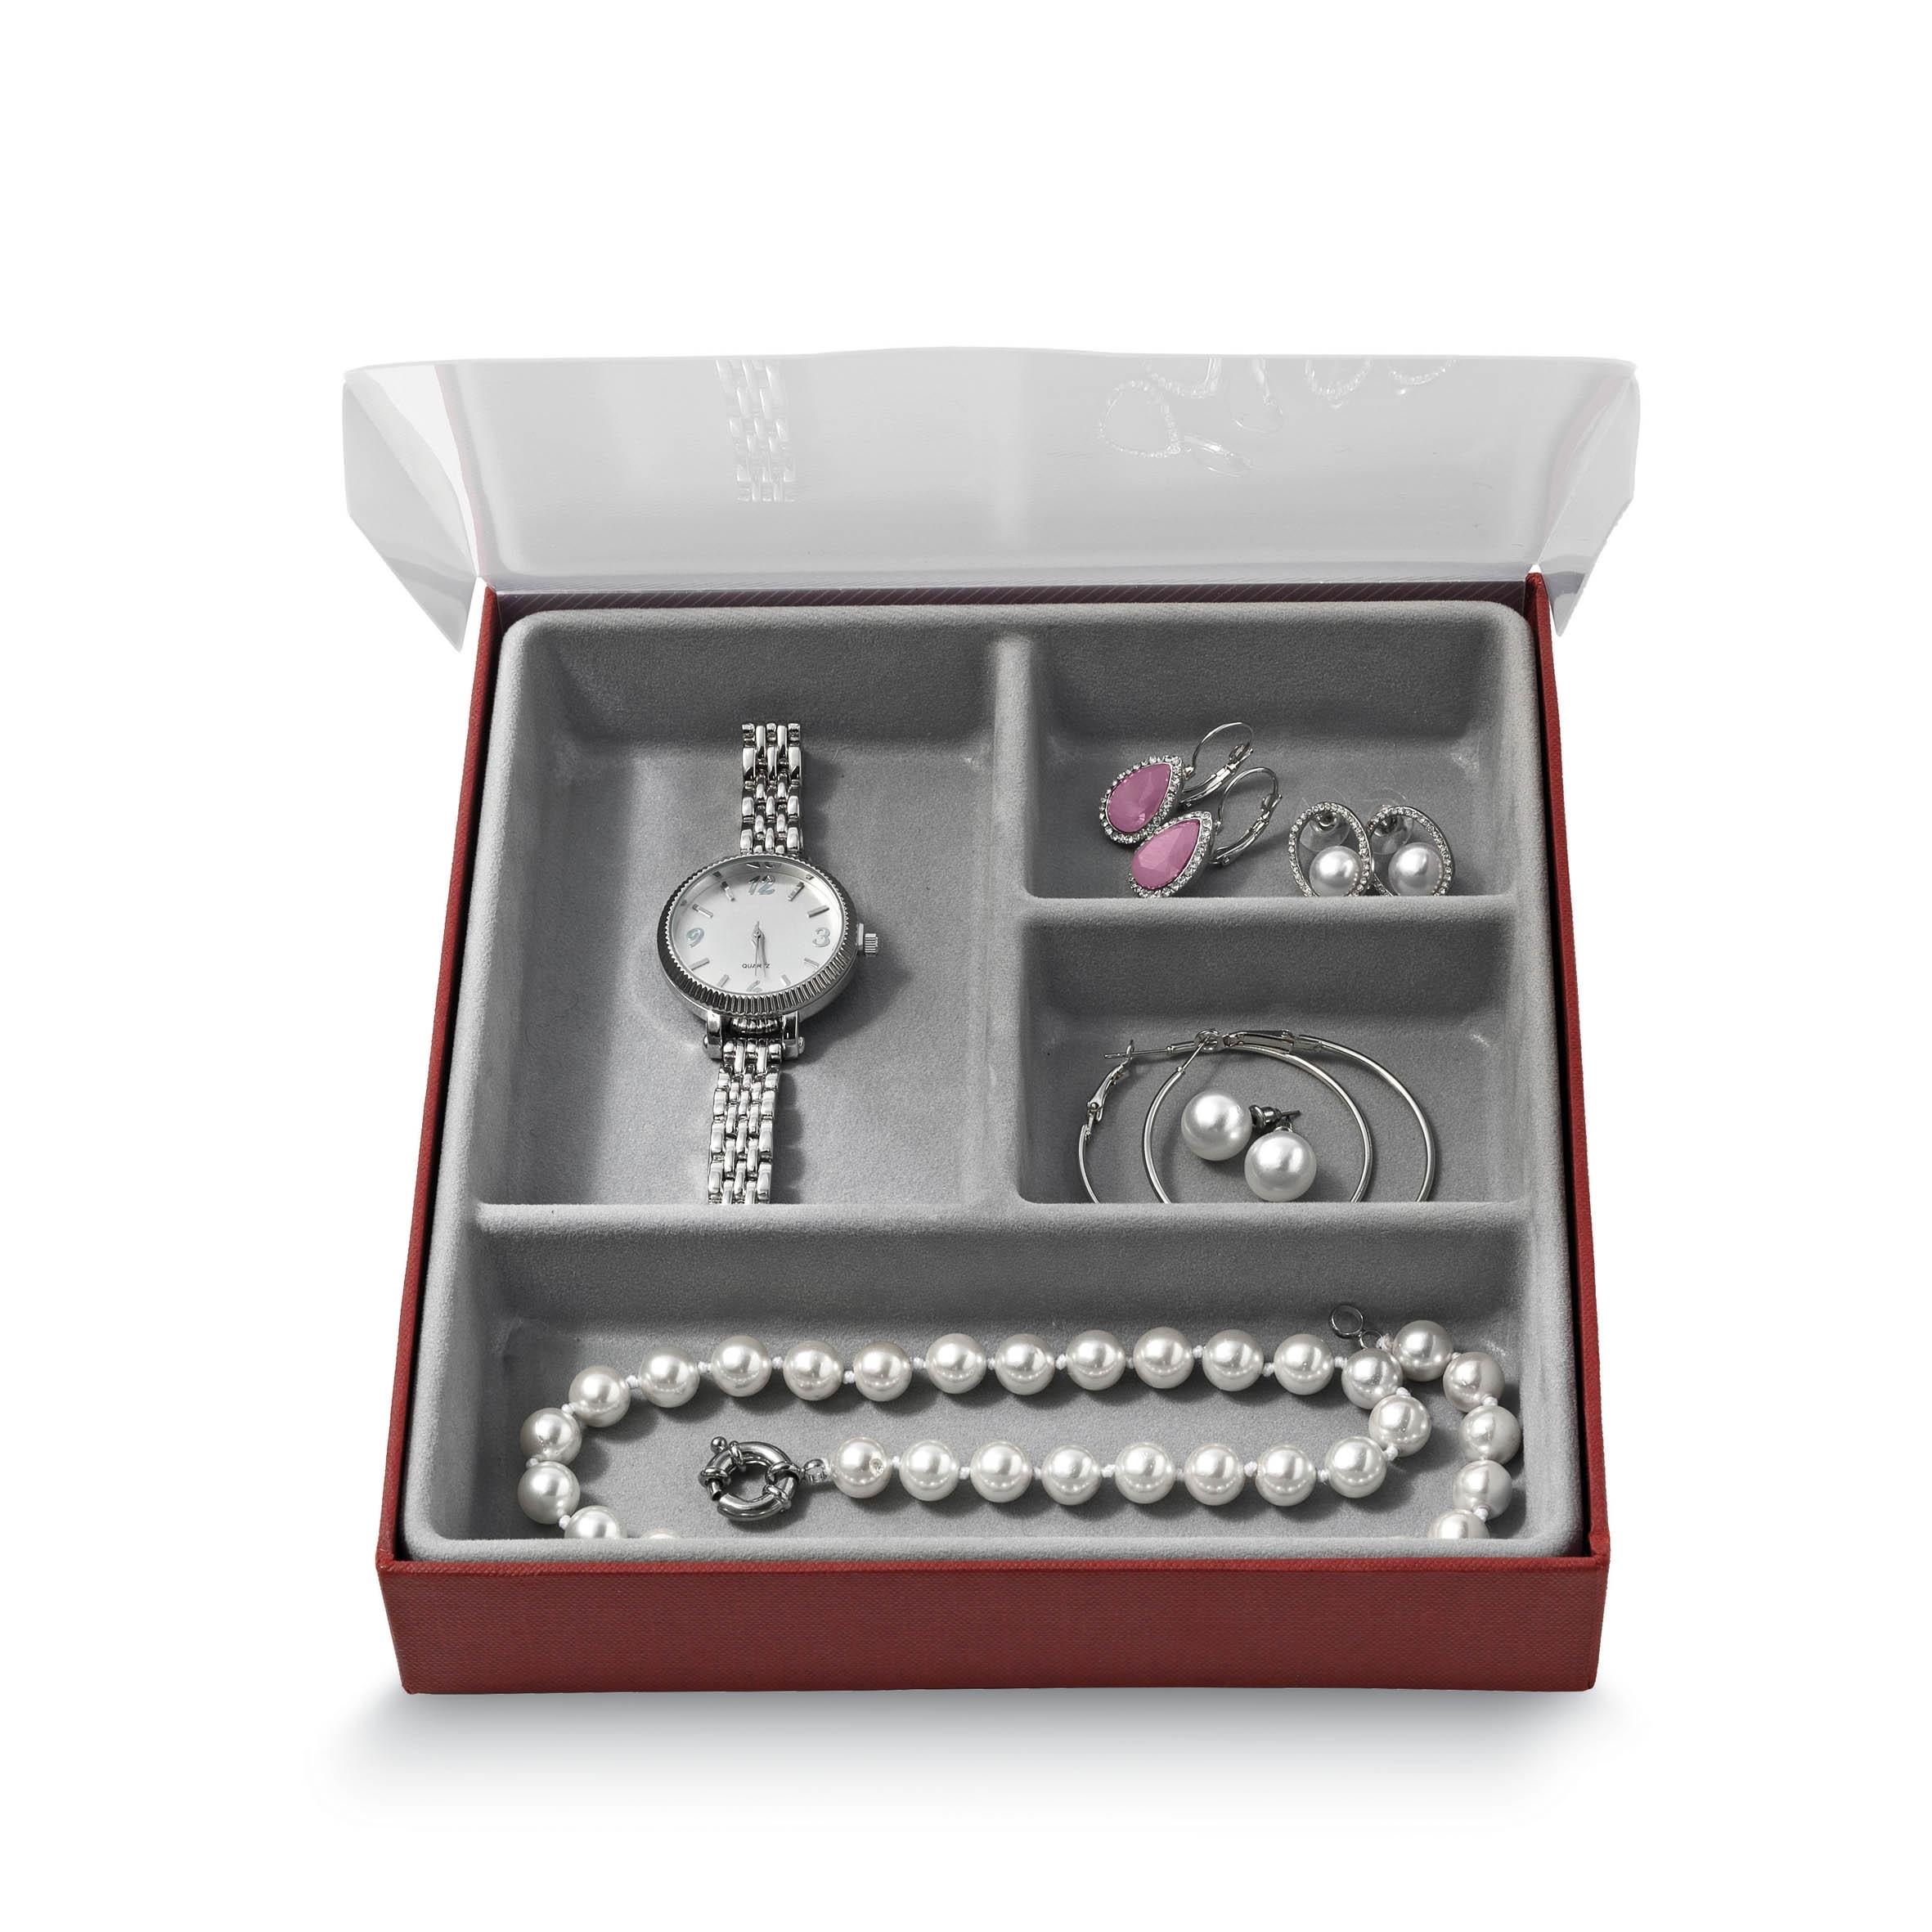 Organizator pentru sertar cu 4 compartimente, Jewel Gri, l18,5xA21,5xH3,5 cm poza